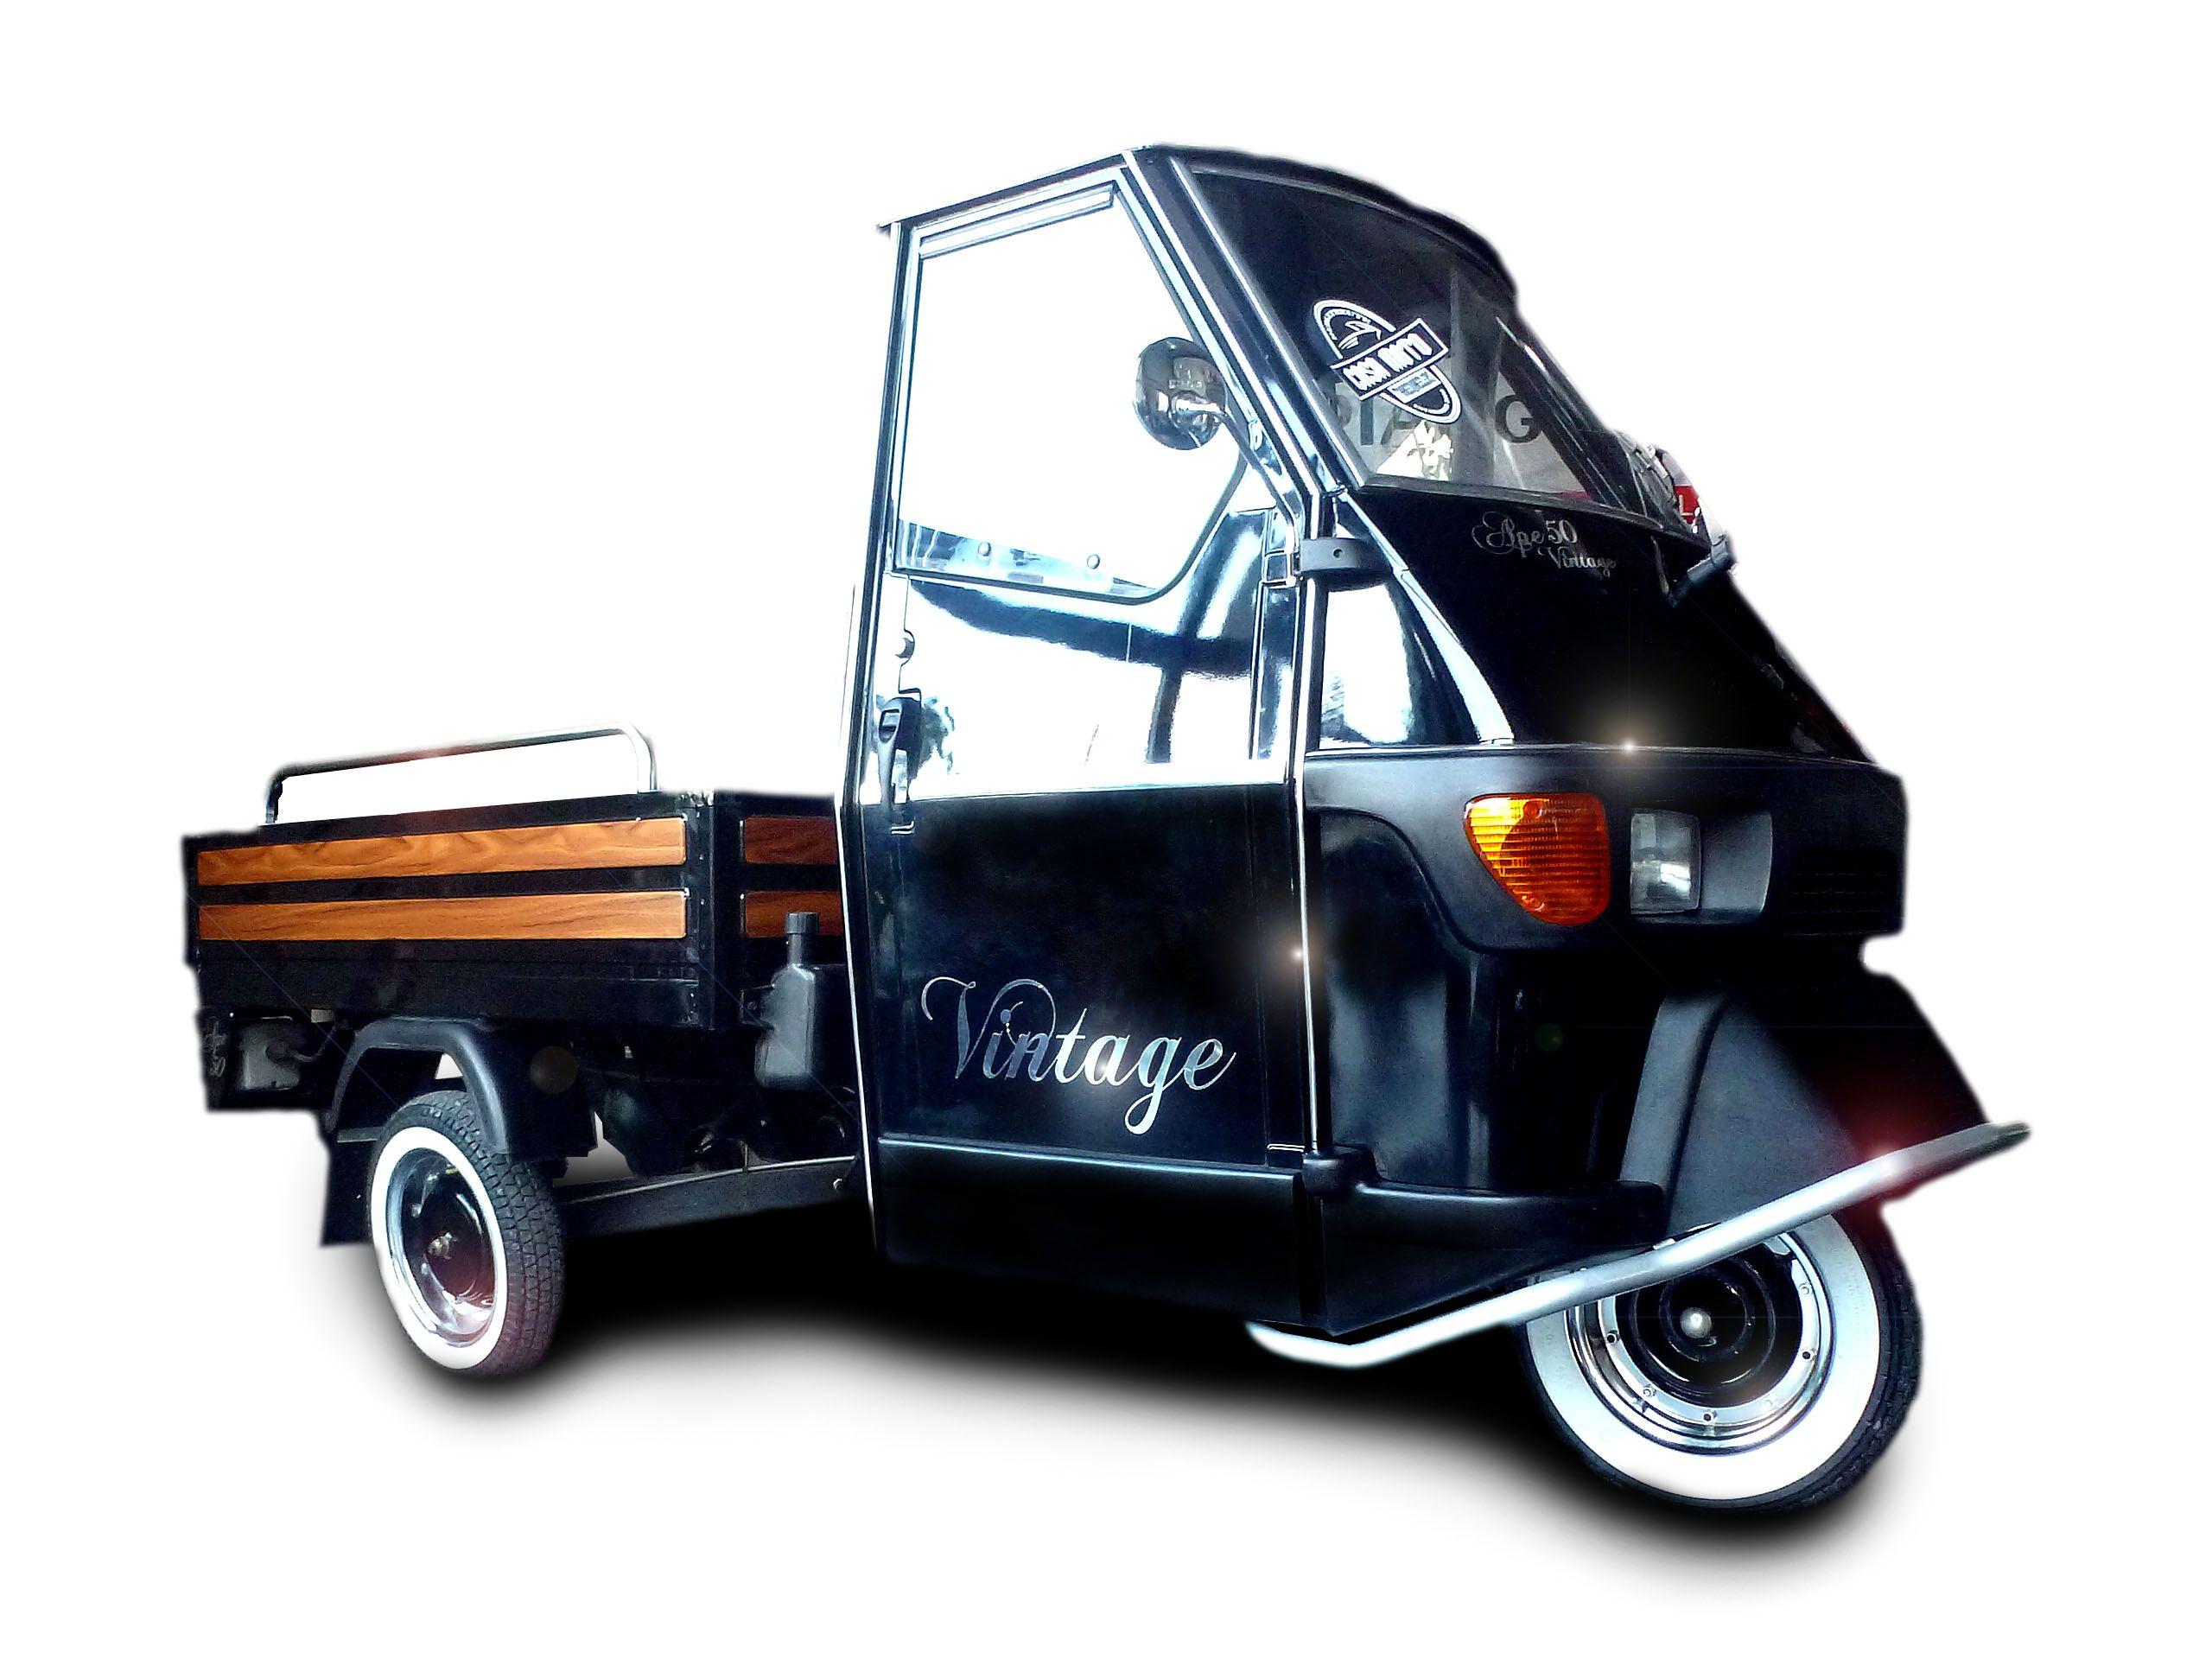 piaggio ape 50 vintage pritschenversion by casa moto. Black Bedroom Furniture Sets. Home Design Ideas